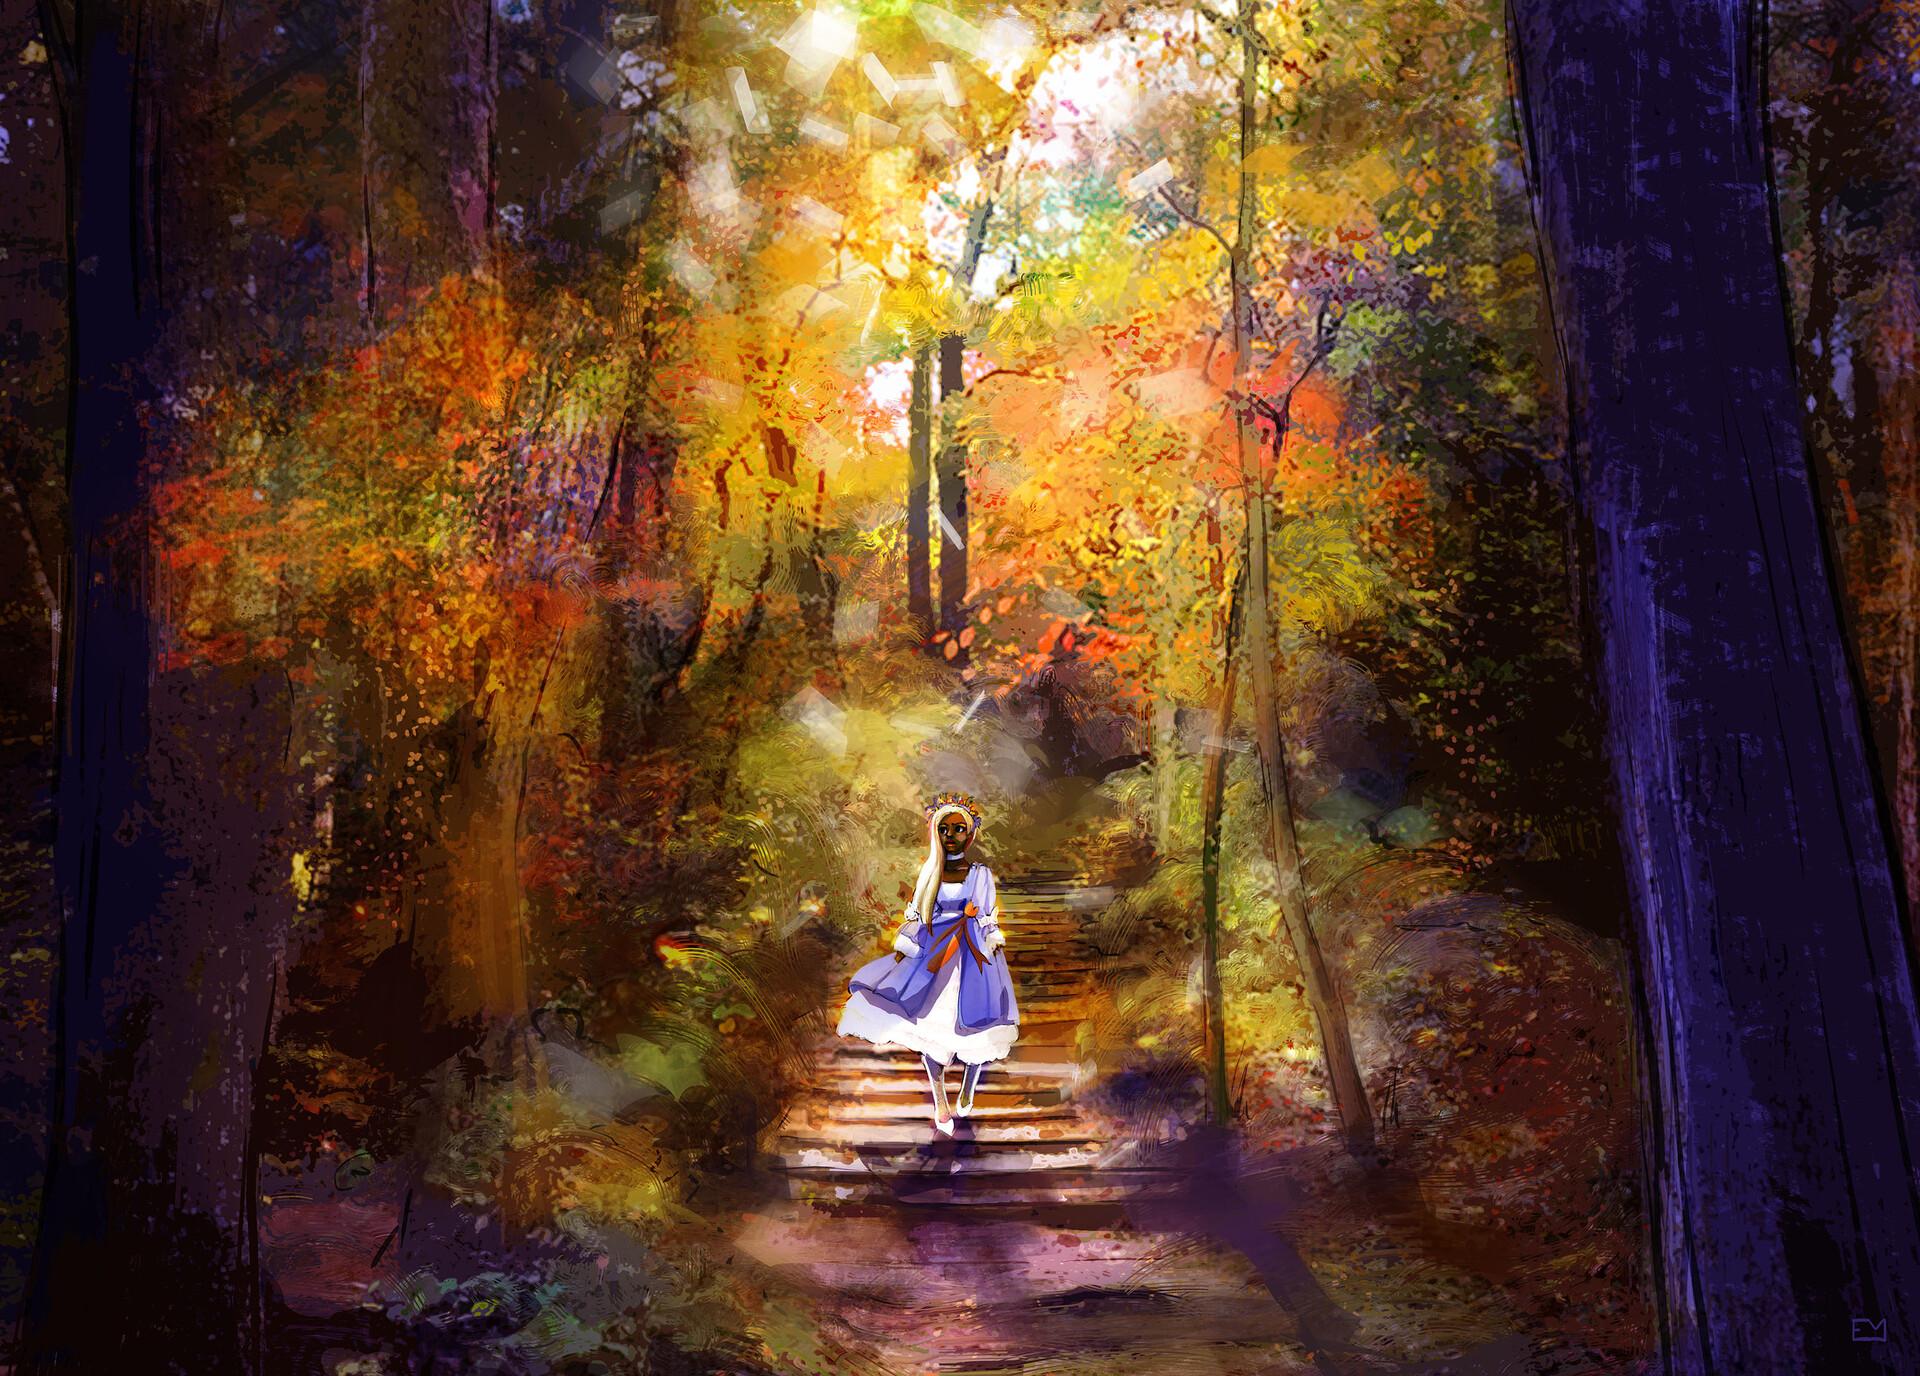 Digital painting - Adobe Photoshop